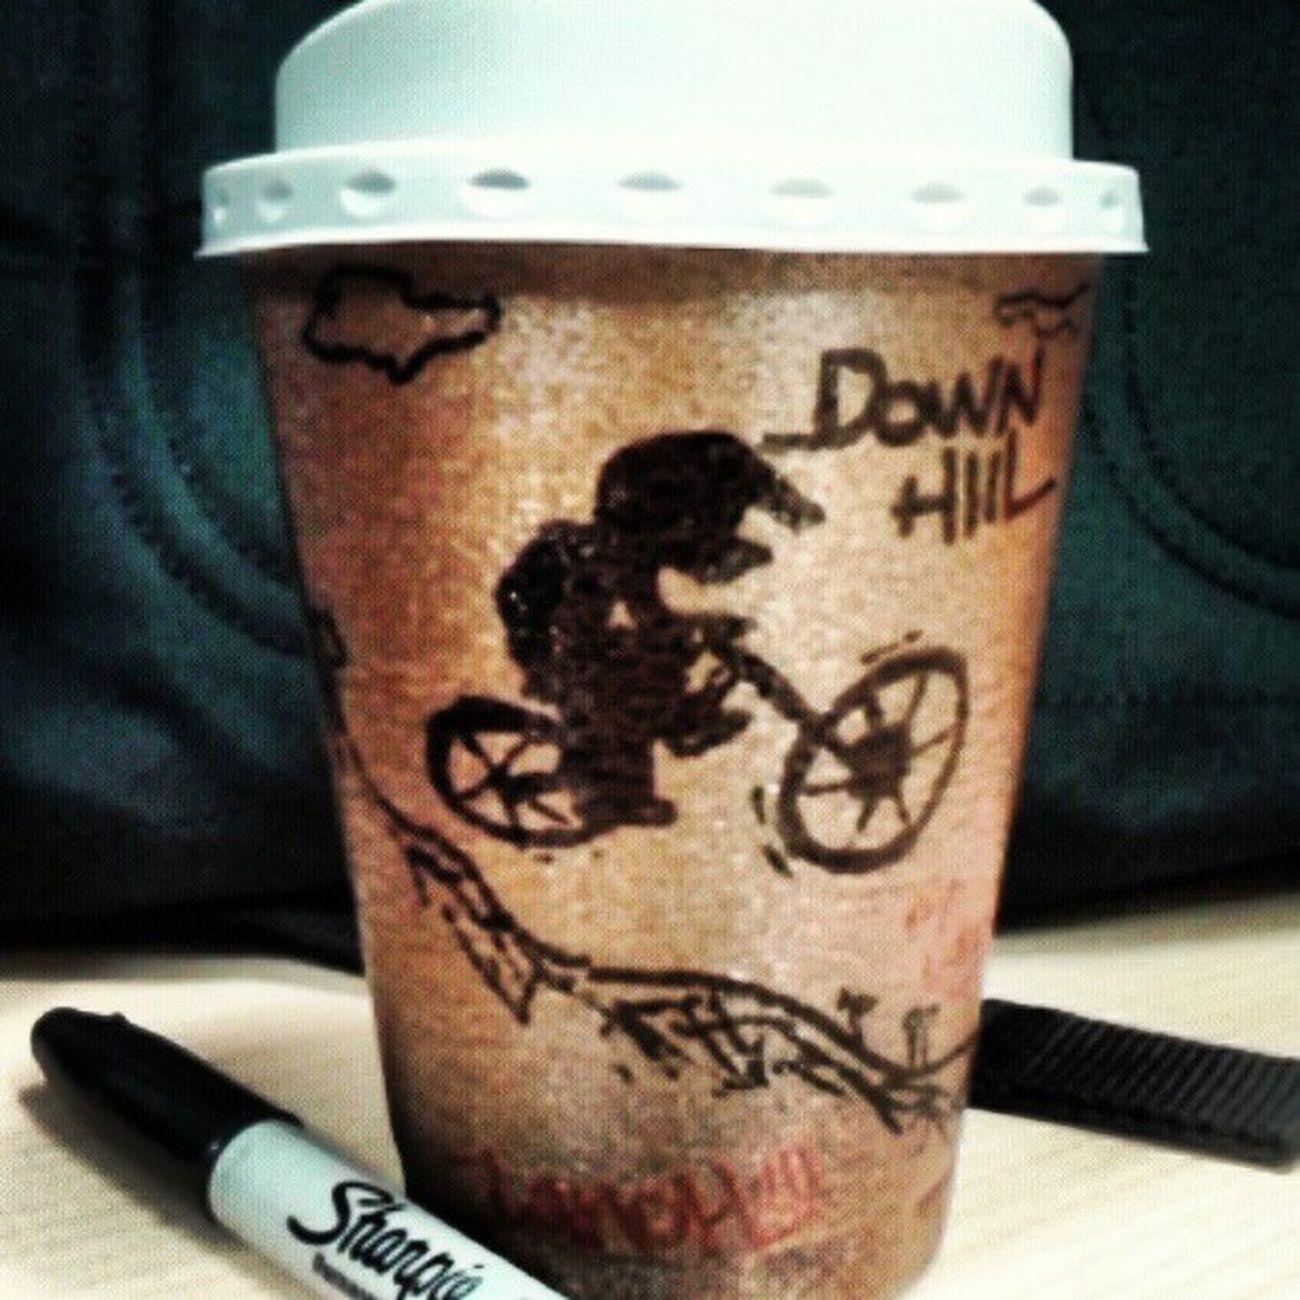 Downhill Coffe Coffecup Sharpie bike bicycle mextagram mountainbike mexigers mtb morningride mybike allshots_ igers igersgdl igworldclub igersguadalajara instagood mextagram